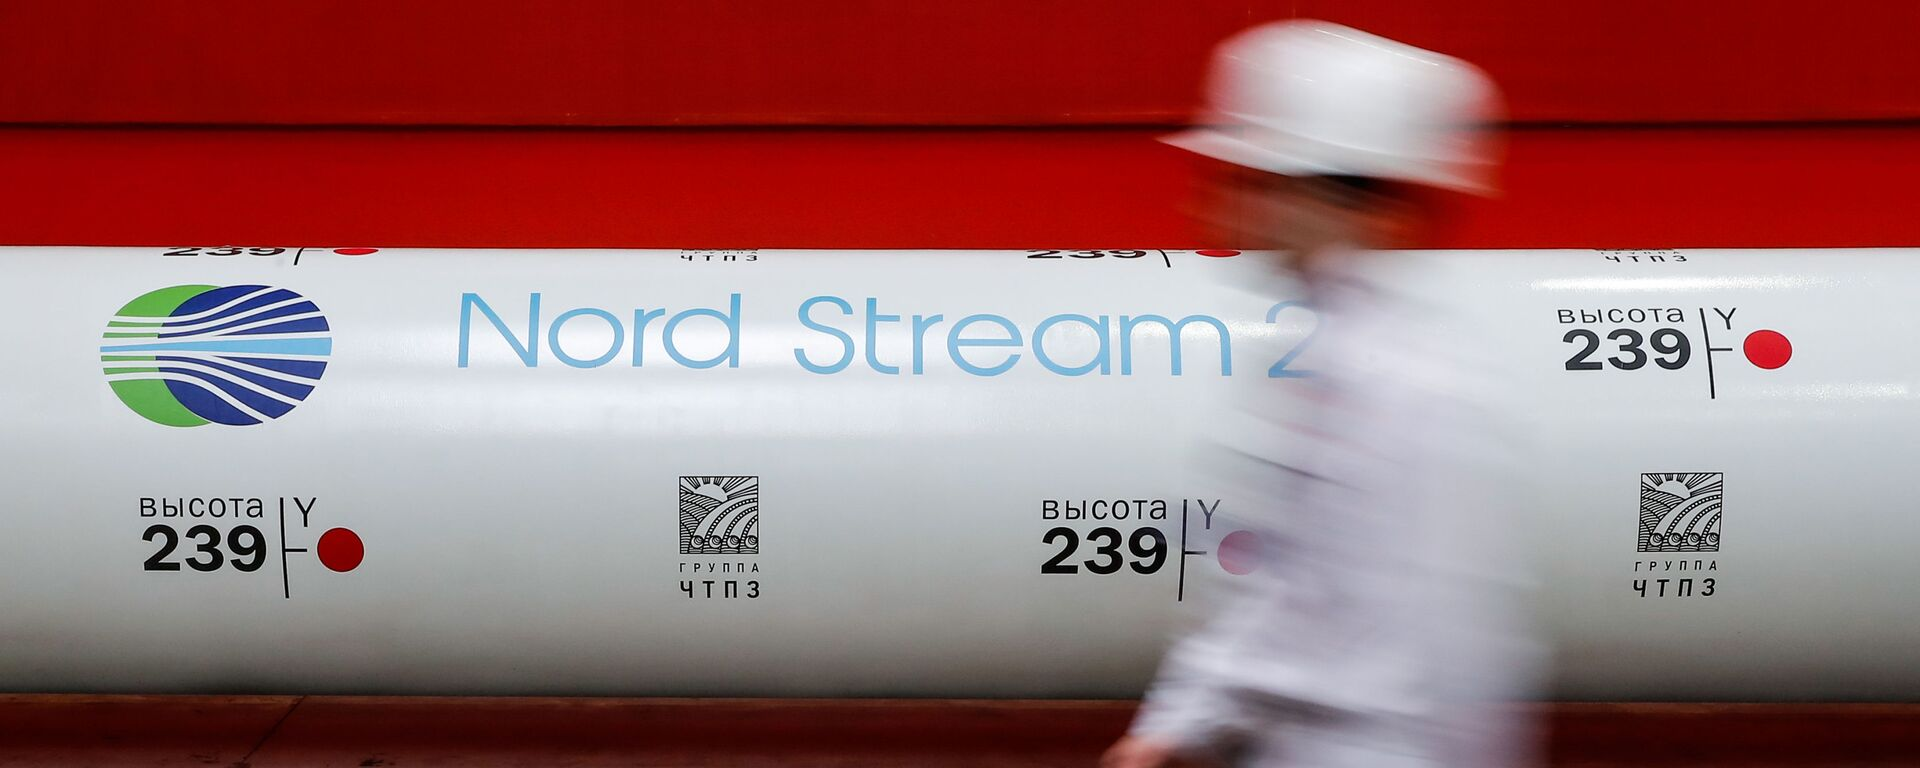 Budowa gazociągu Nord Stream 2 - Sputnik Polska, 1920, 07.06.2021